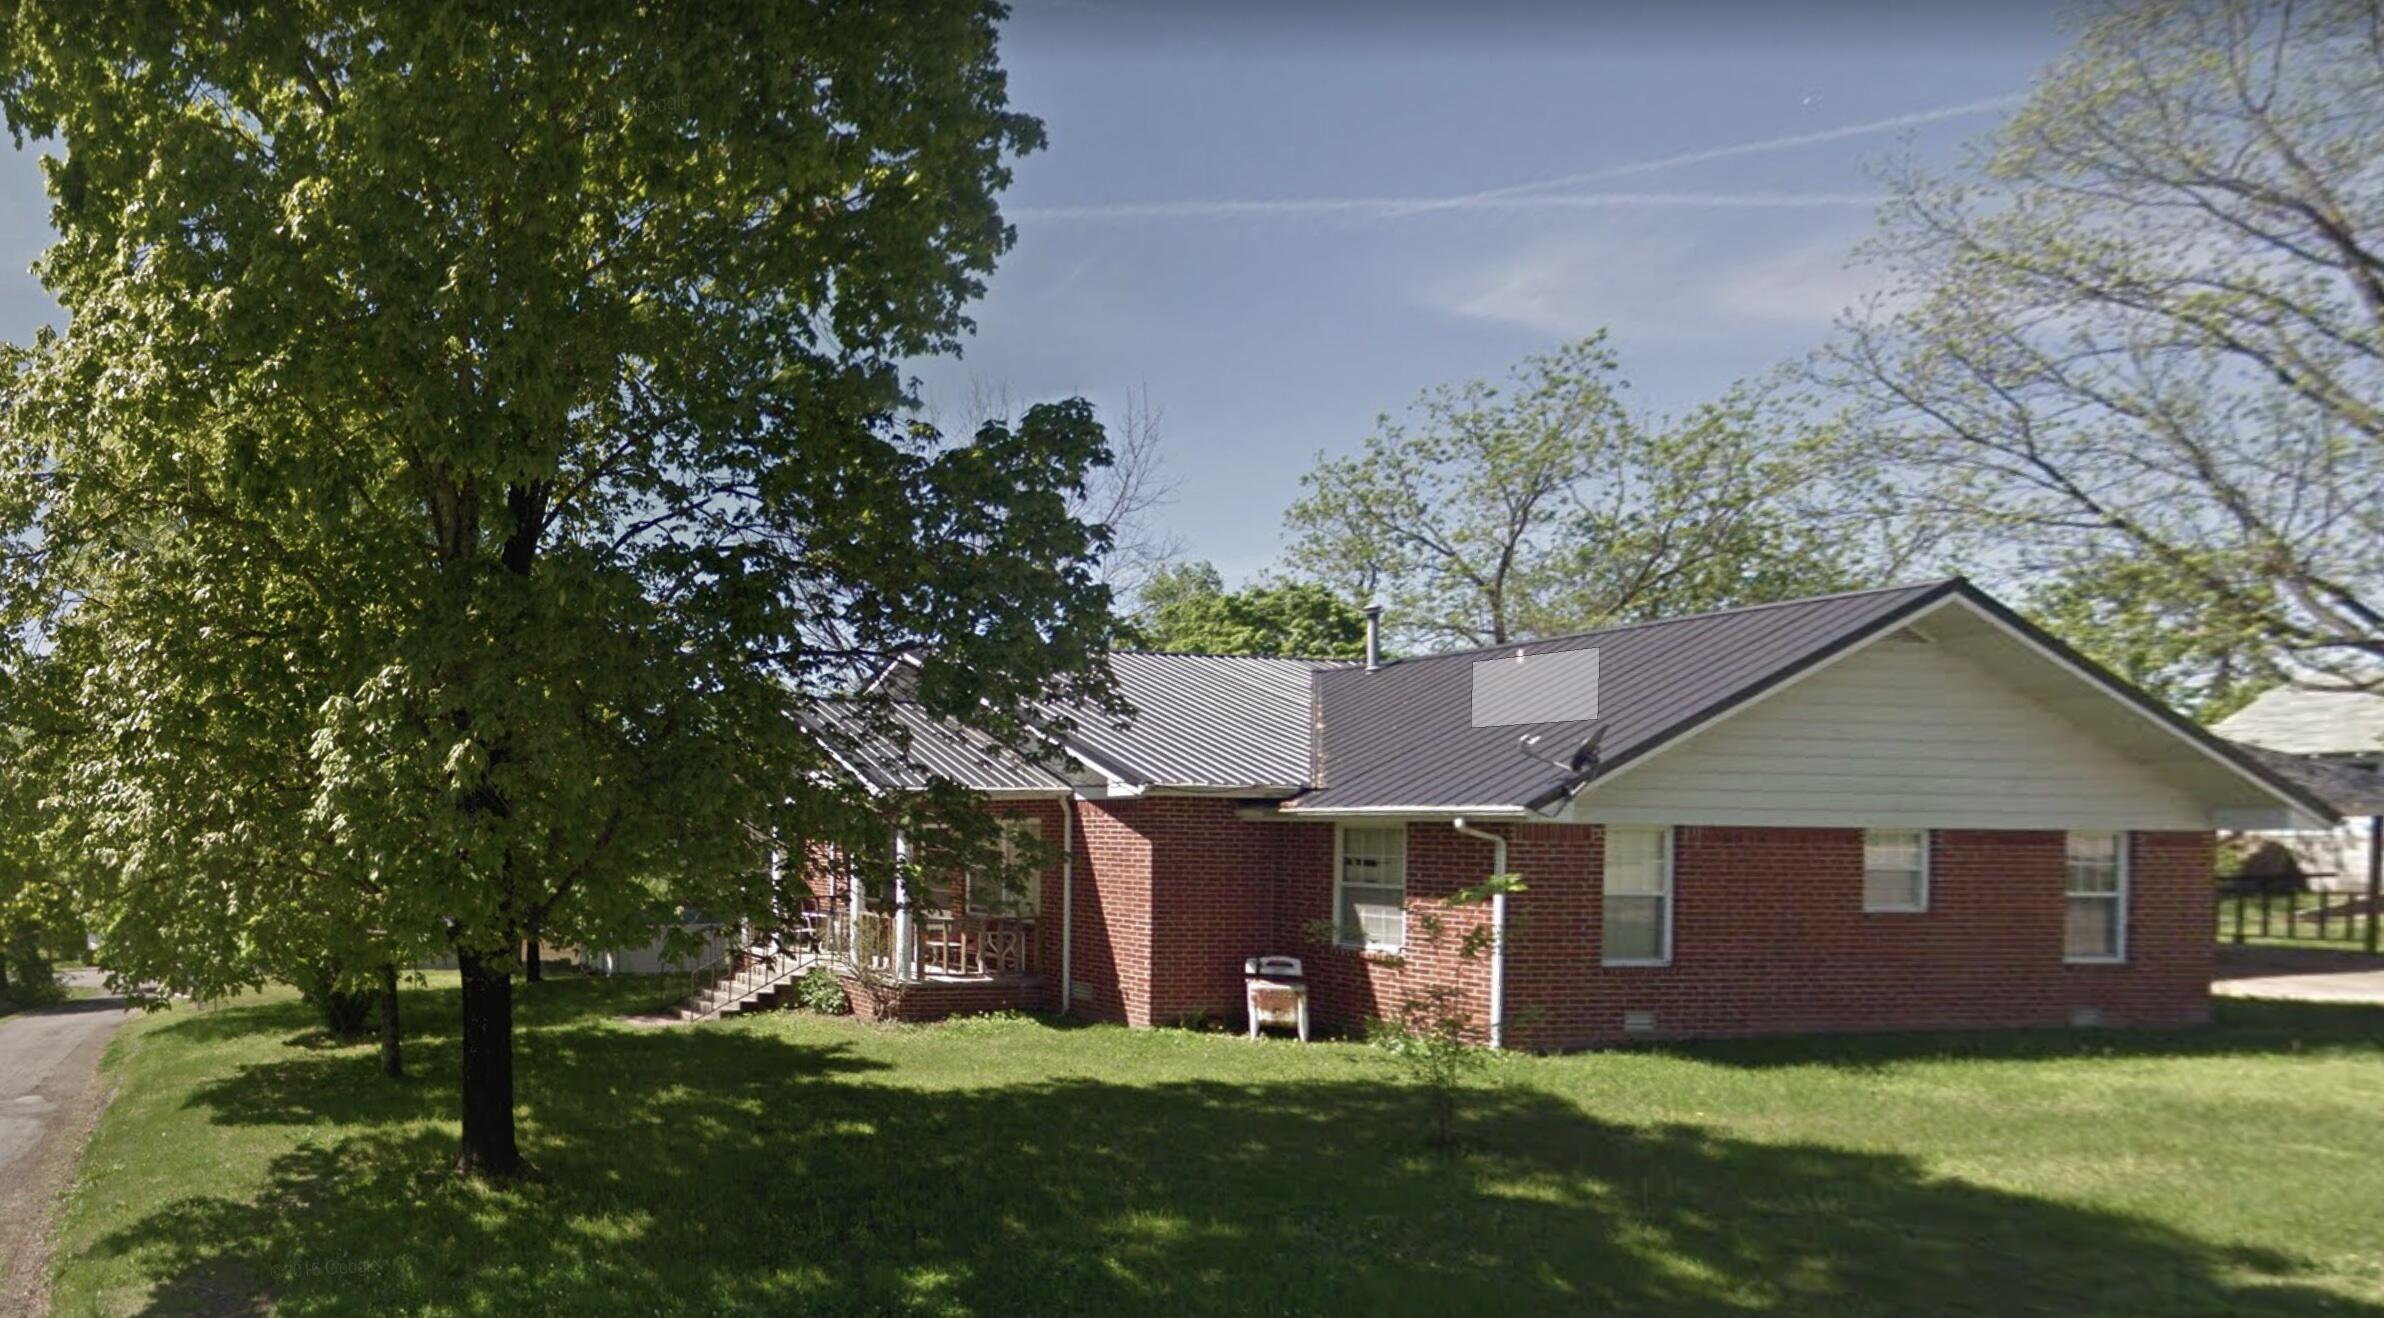 158 4th Street Gainesville, MO 65655